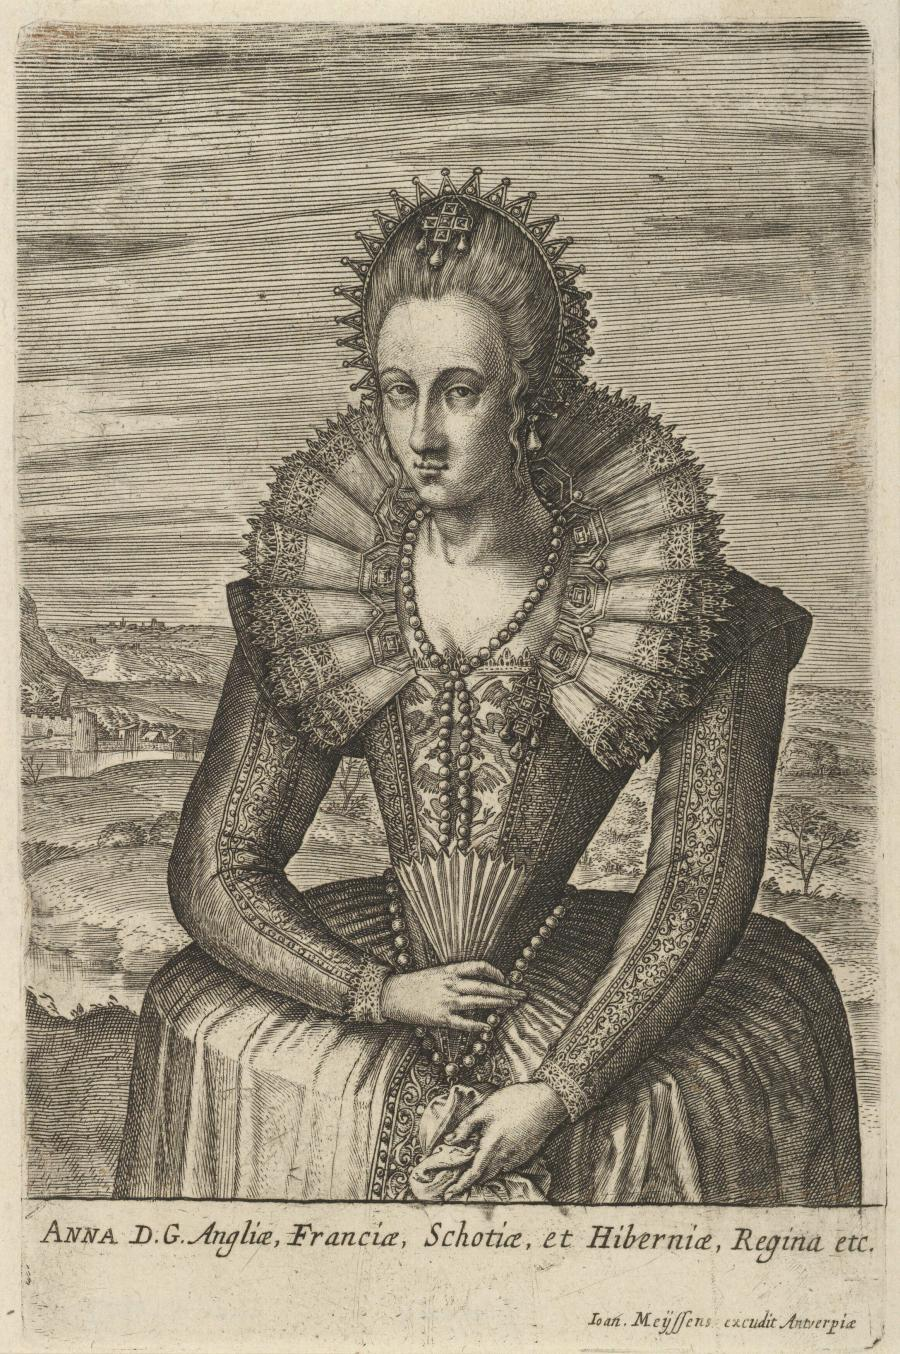 Portrait of Anne of Denmark, Queen of England